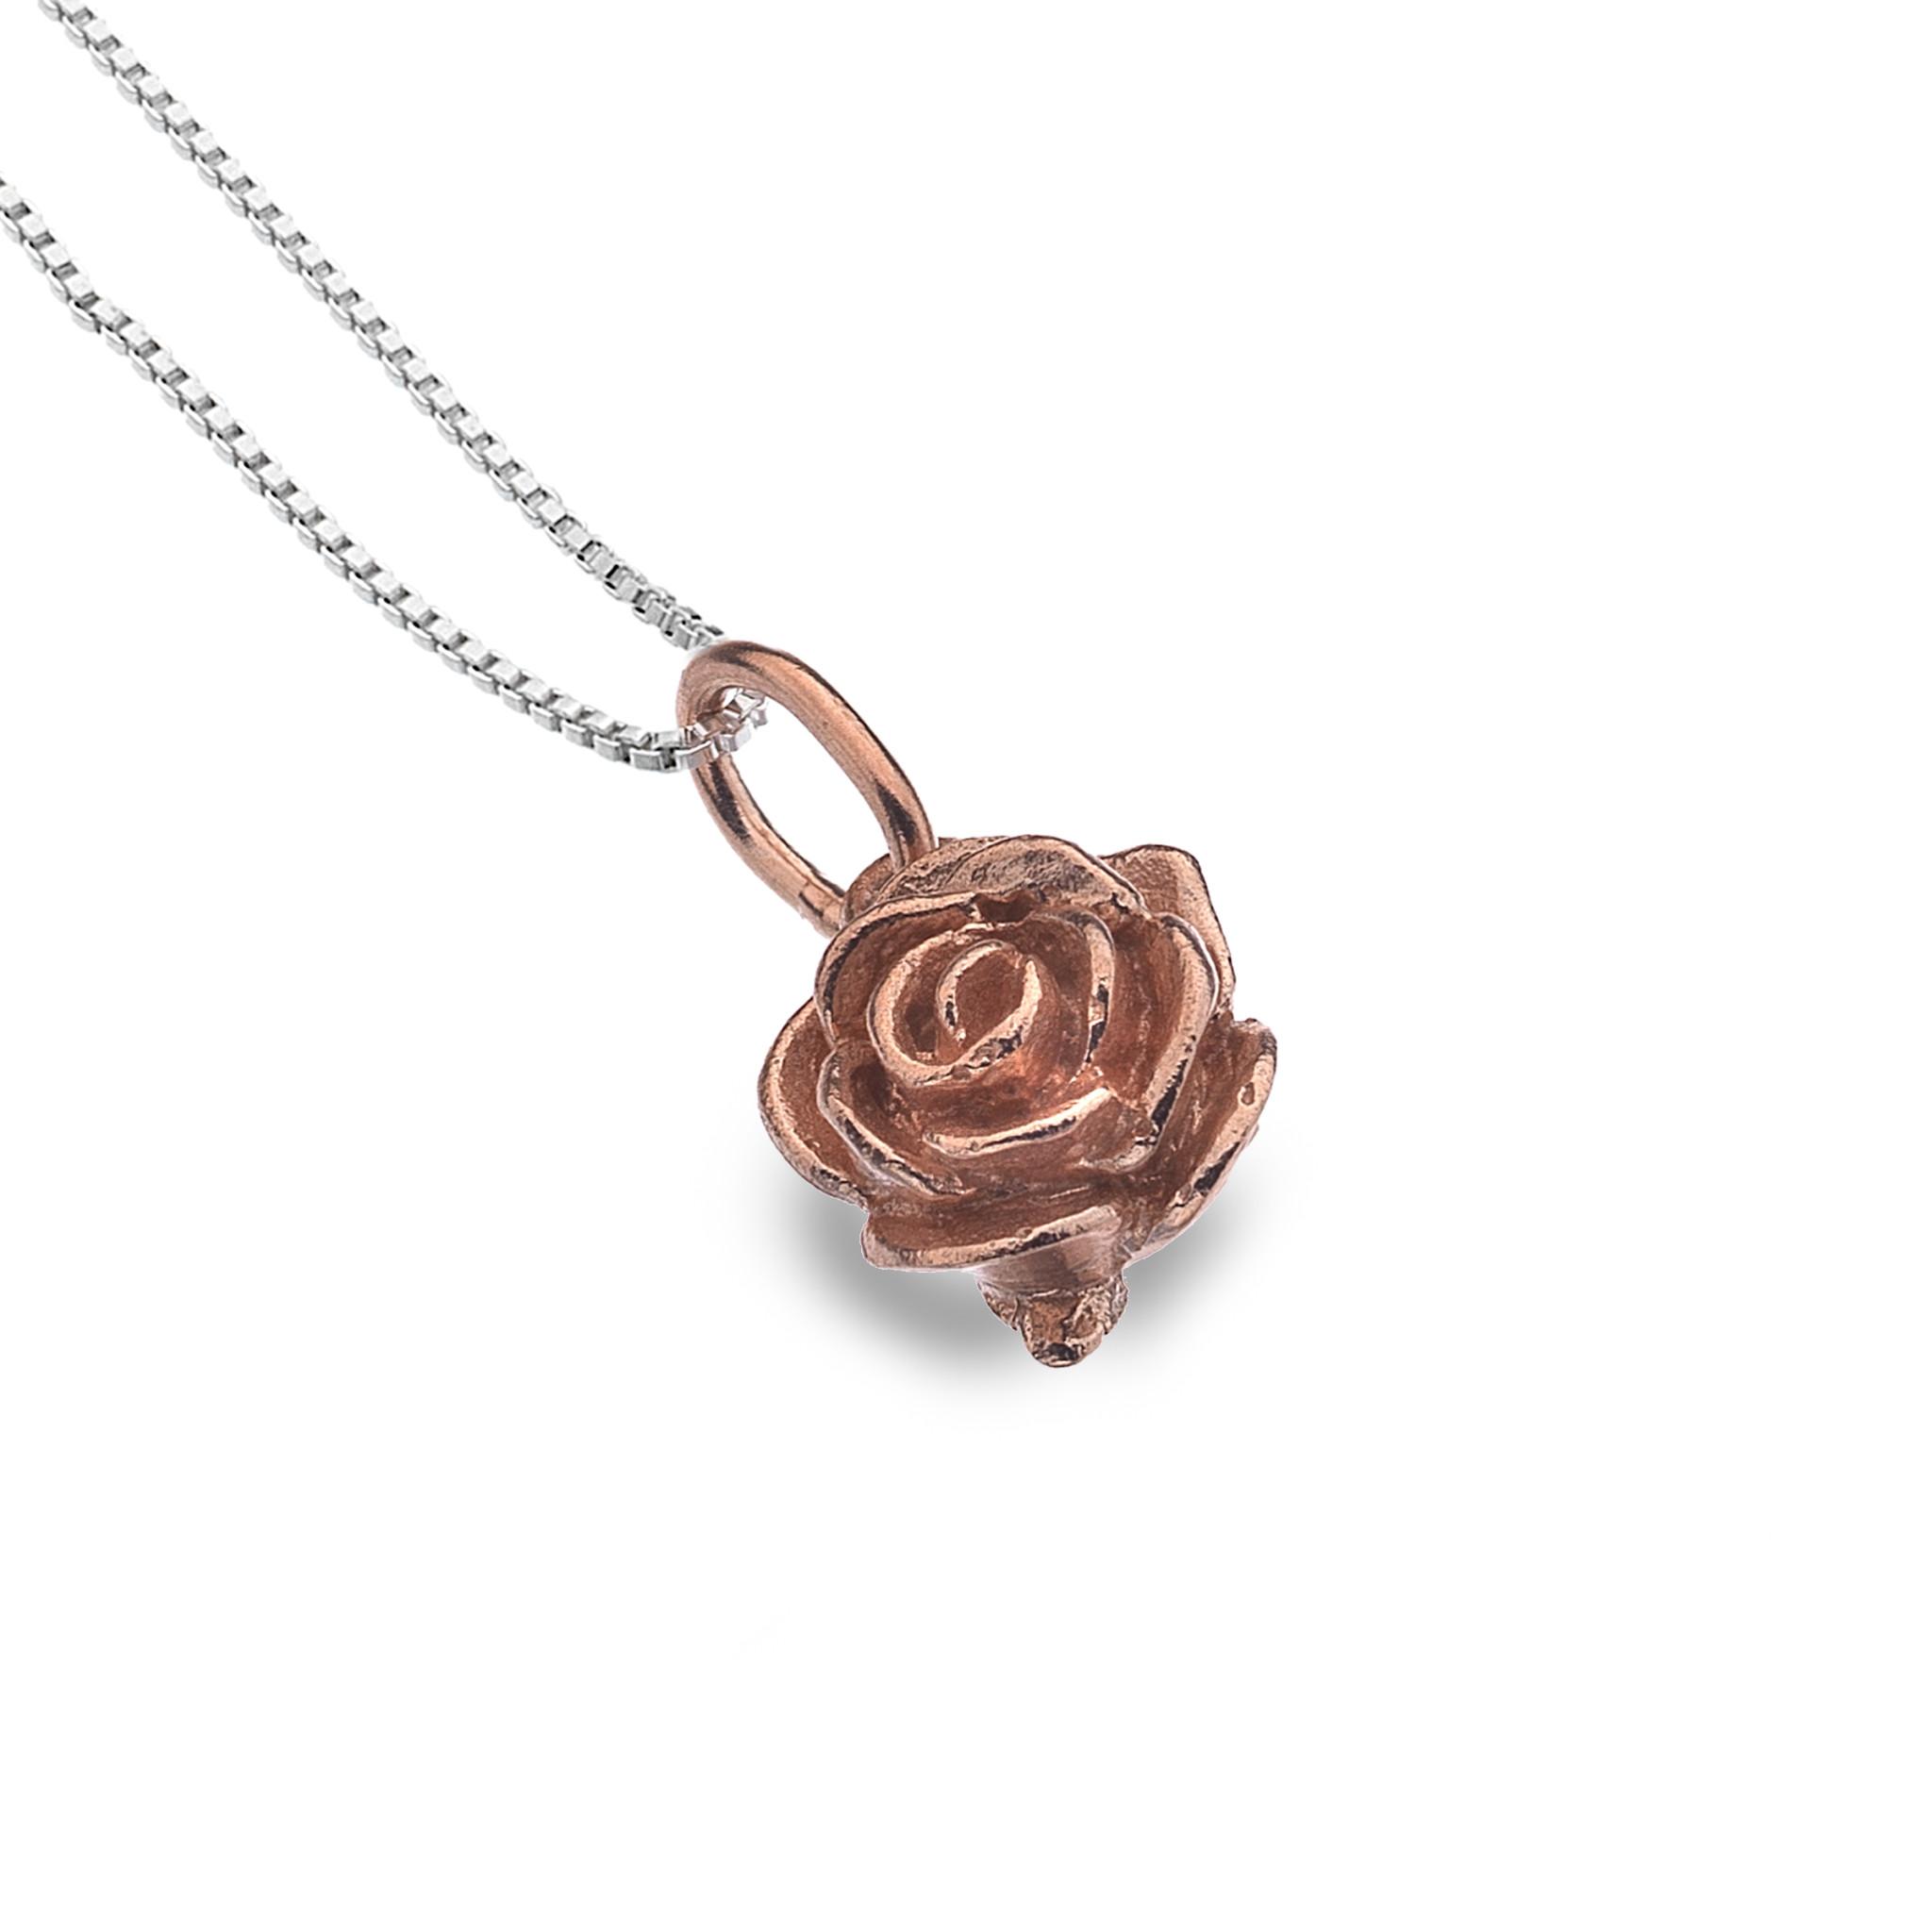 f6f6238c6 Sterling Silver & Rose Gold Vermeil Rose Pendant | Reppin & Jones ...